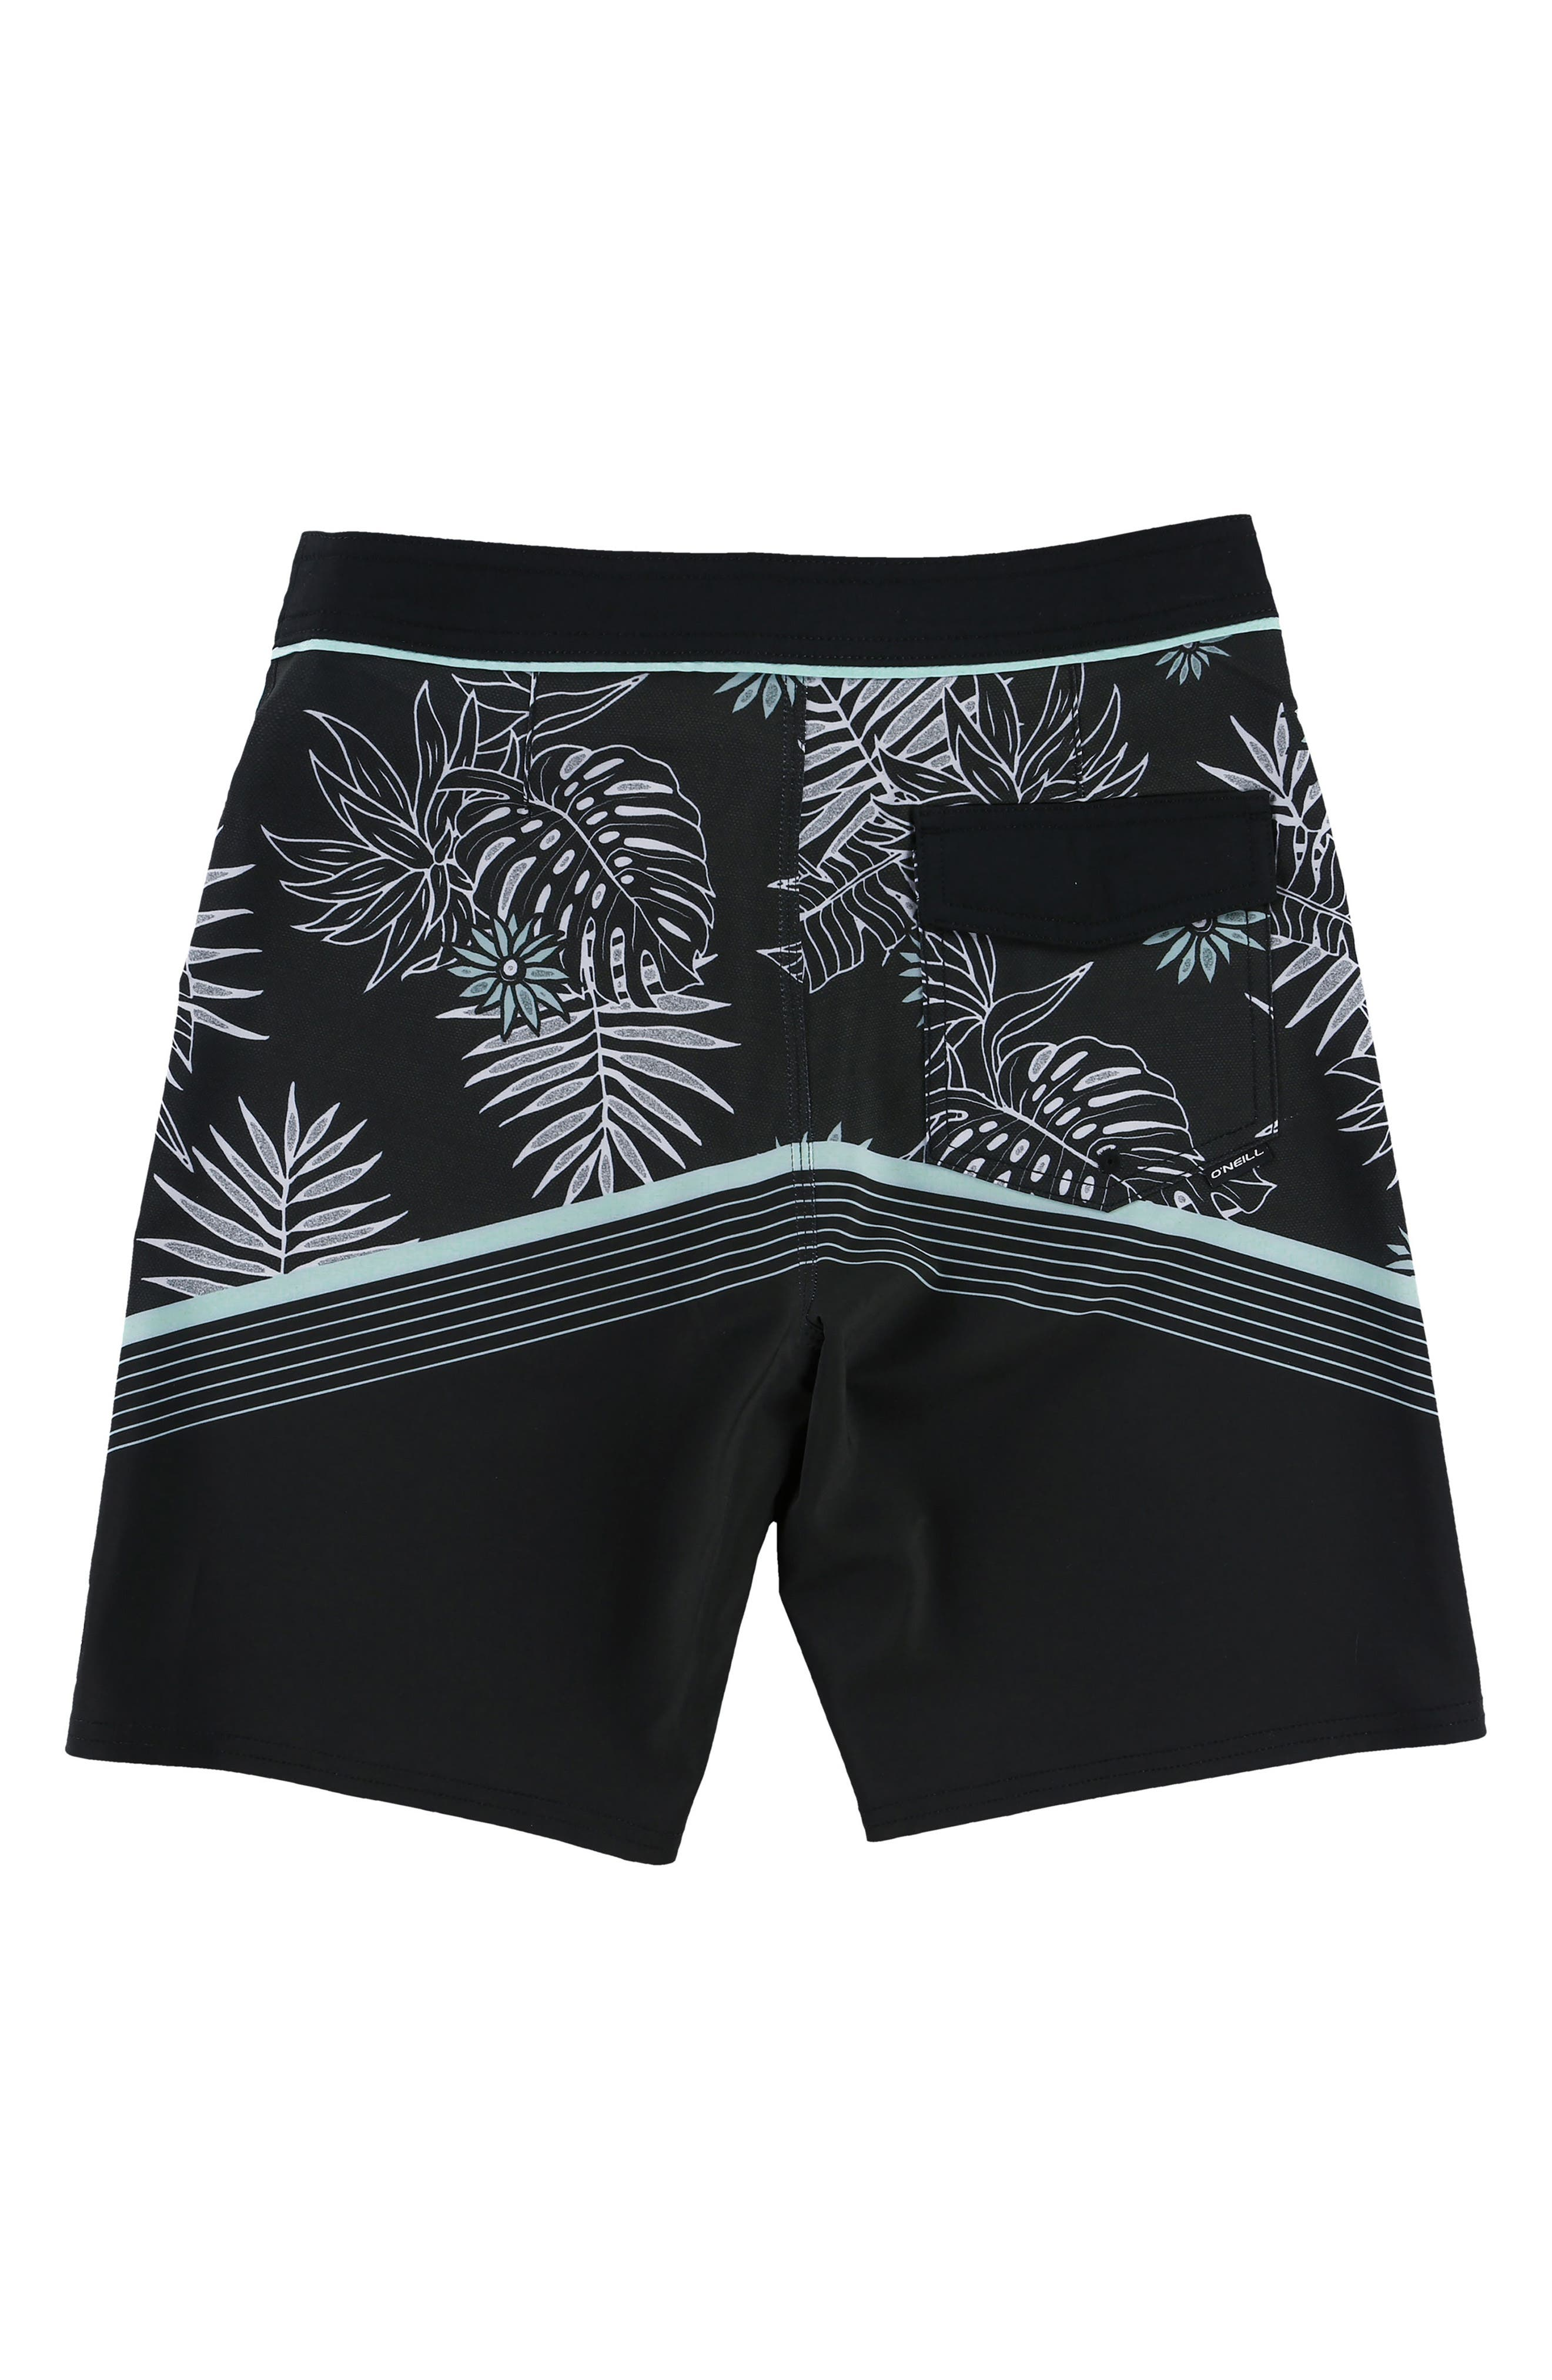 Hyperfreak Tradewinds Board Shorts,                         Main,                         color, 001